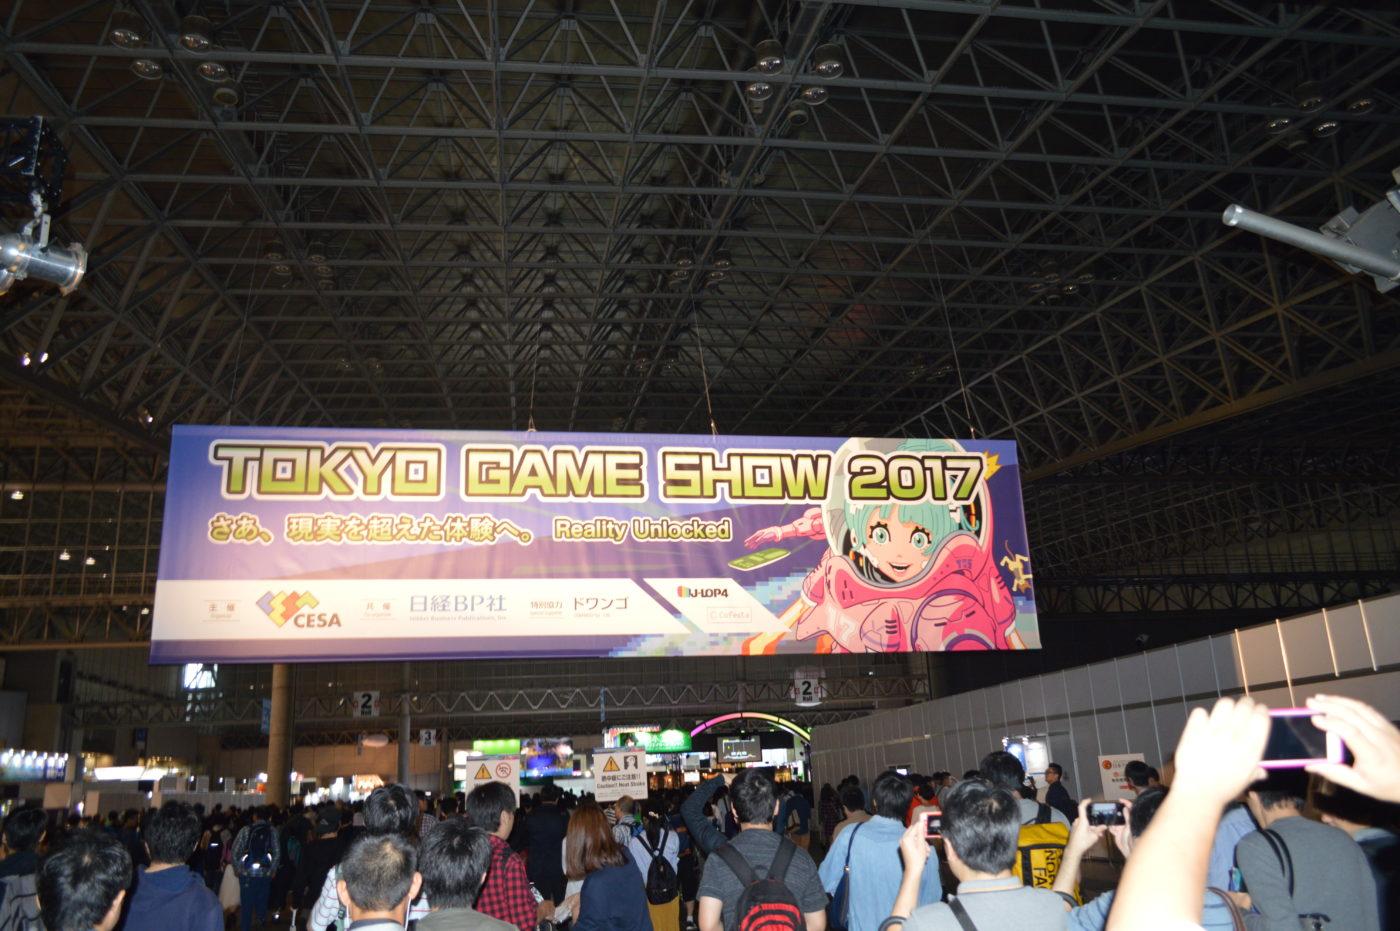 Tokyo Game Show 2017, foto dell'ingresso.